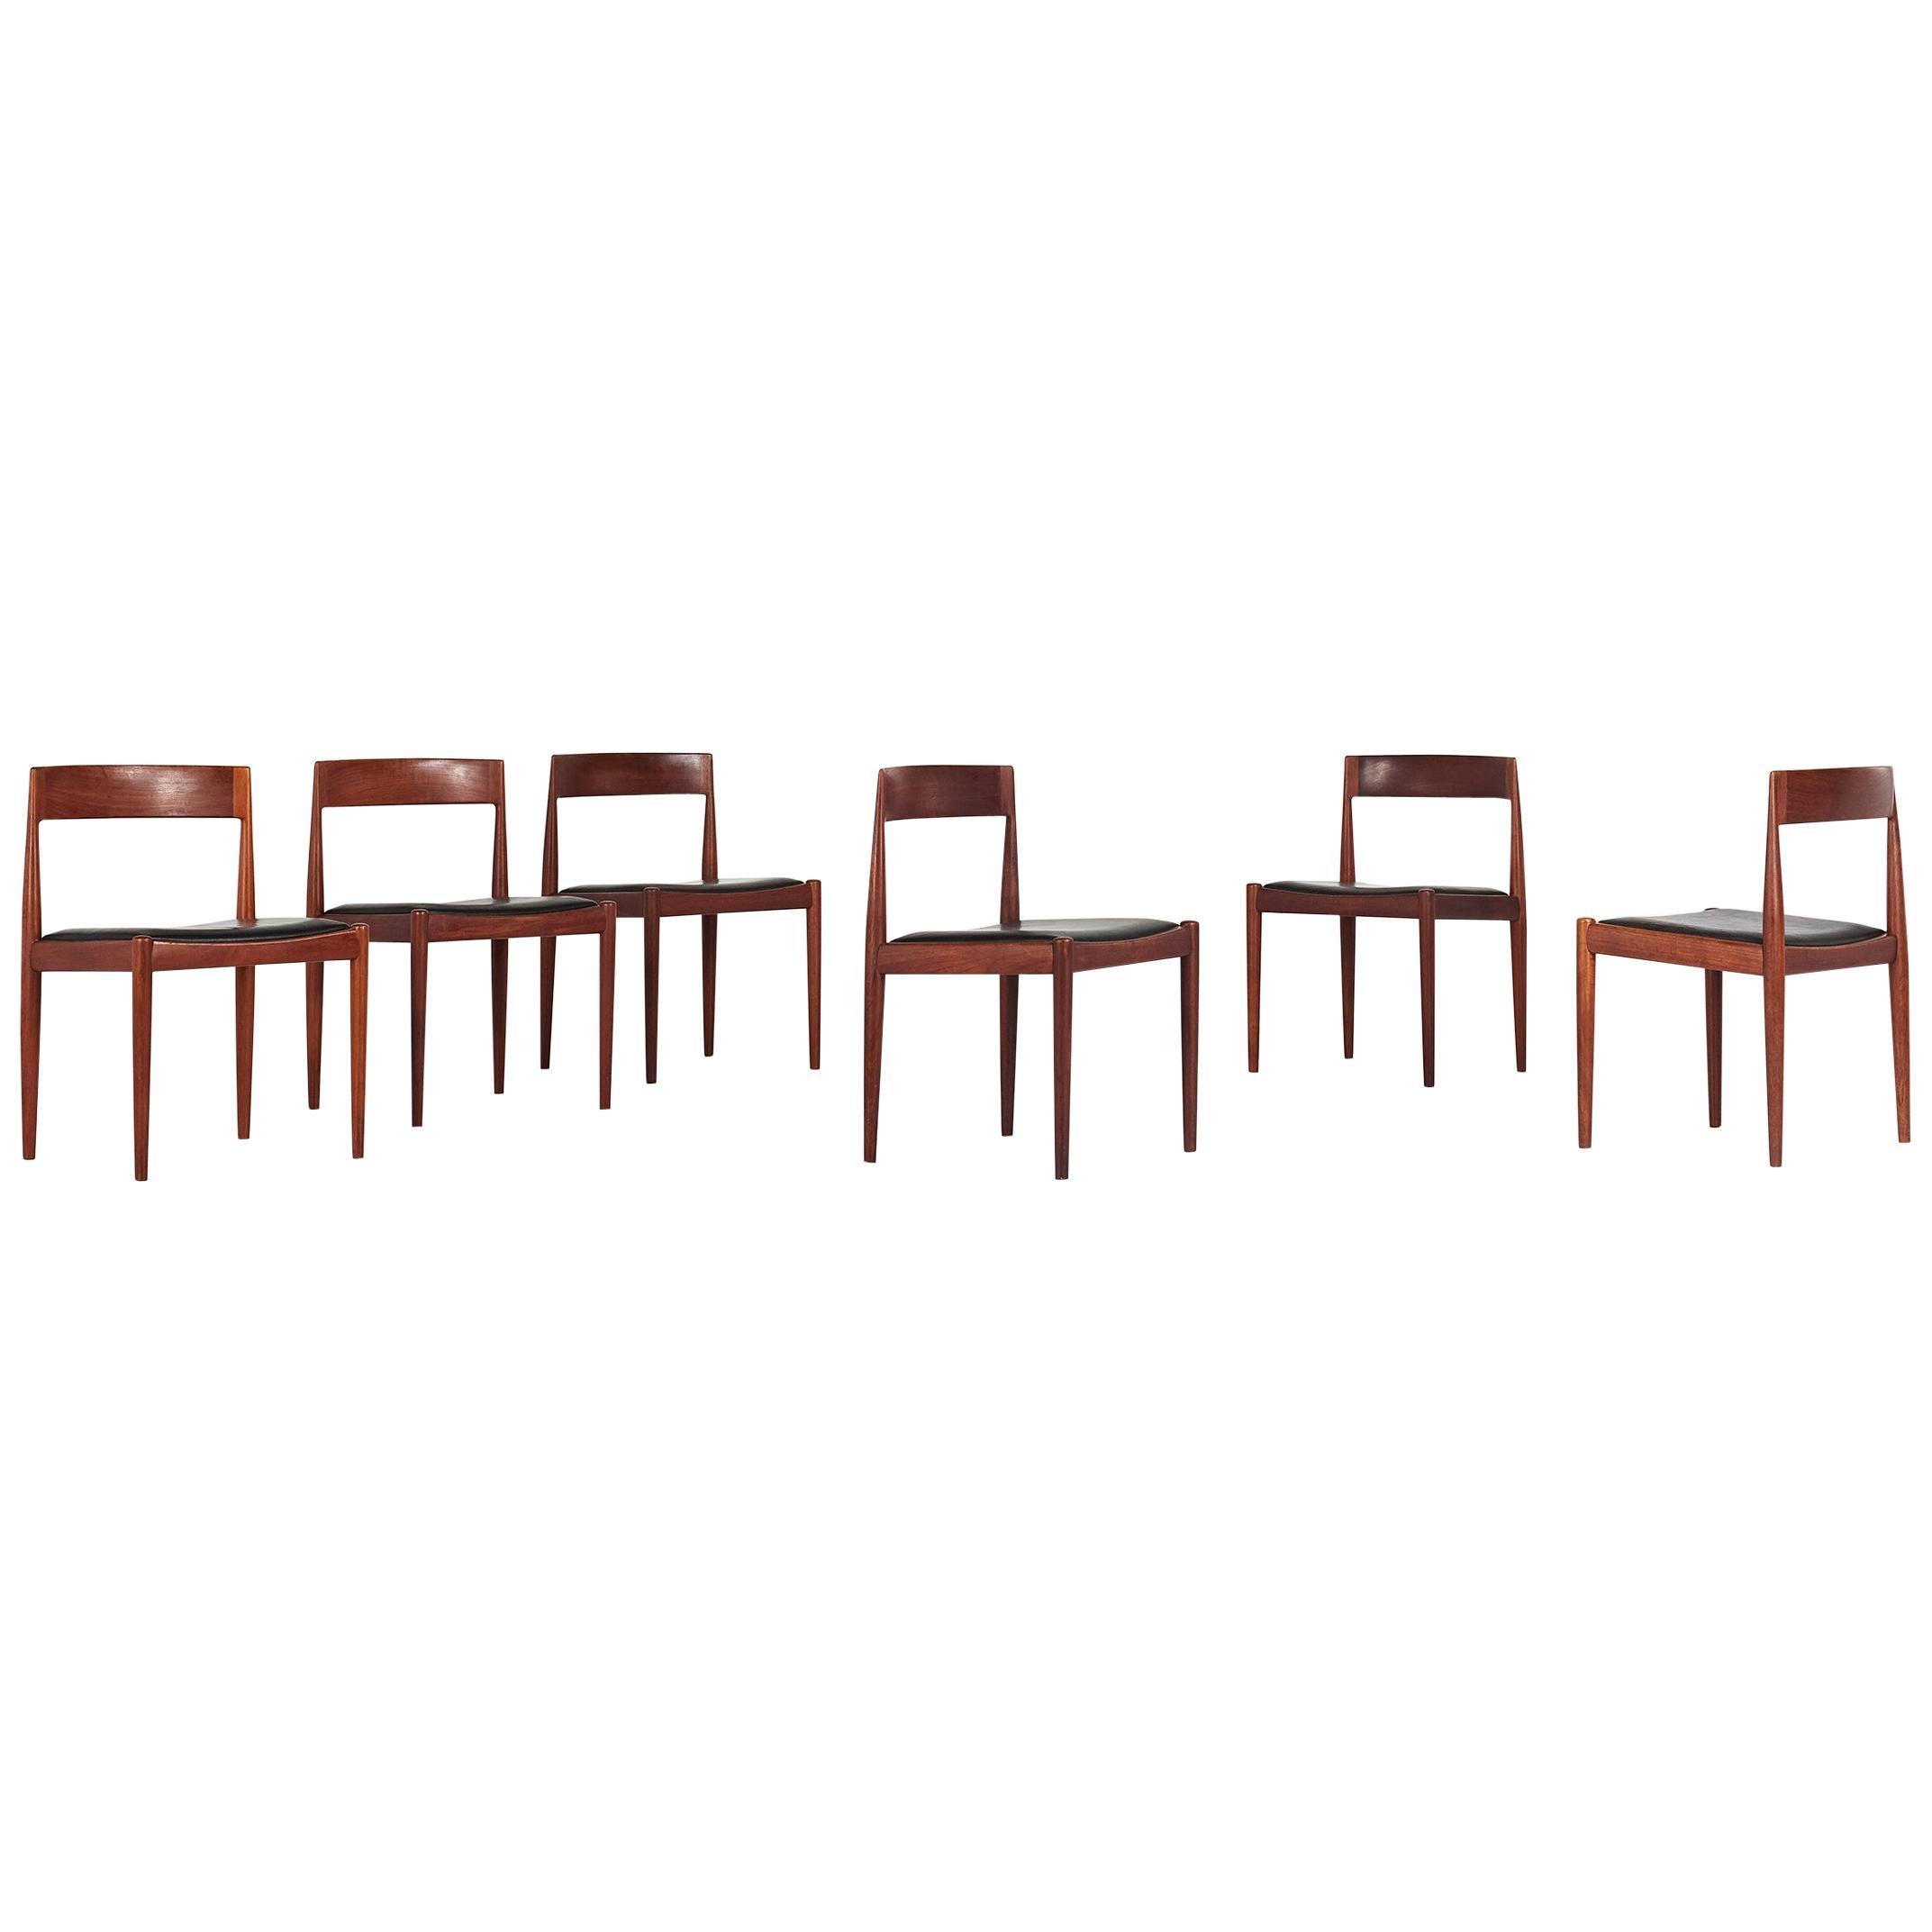 "Kai Kristiansen, Set of Six ""4110"" Chairs for Fritz Hansen, Denmark, C. 1960"